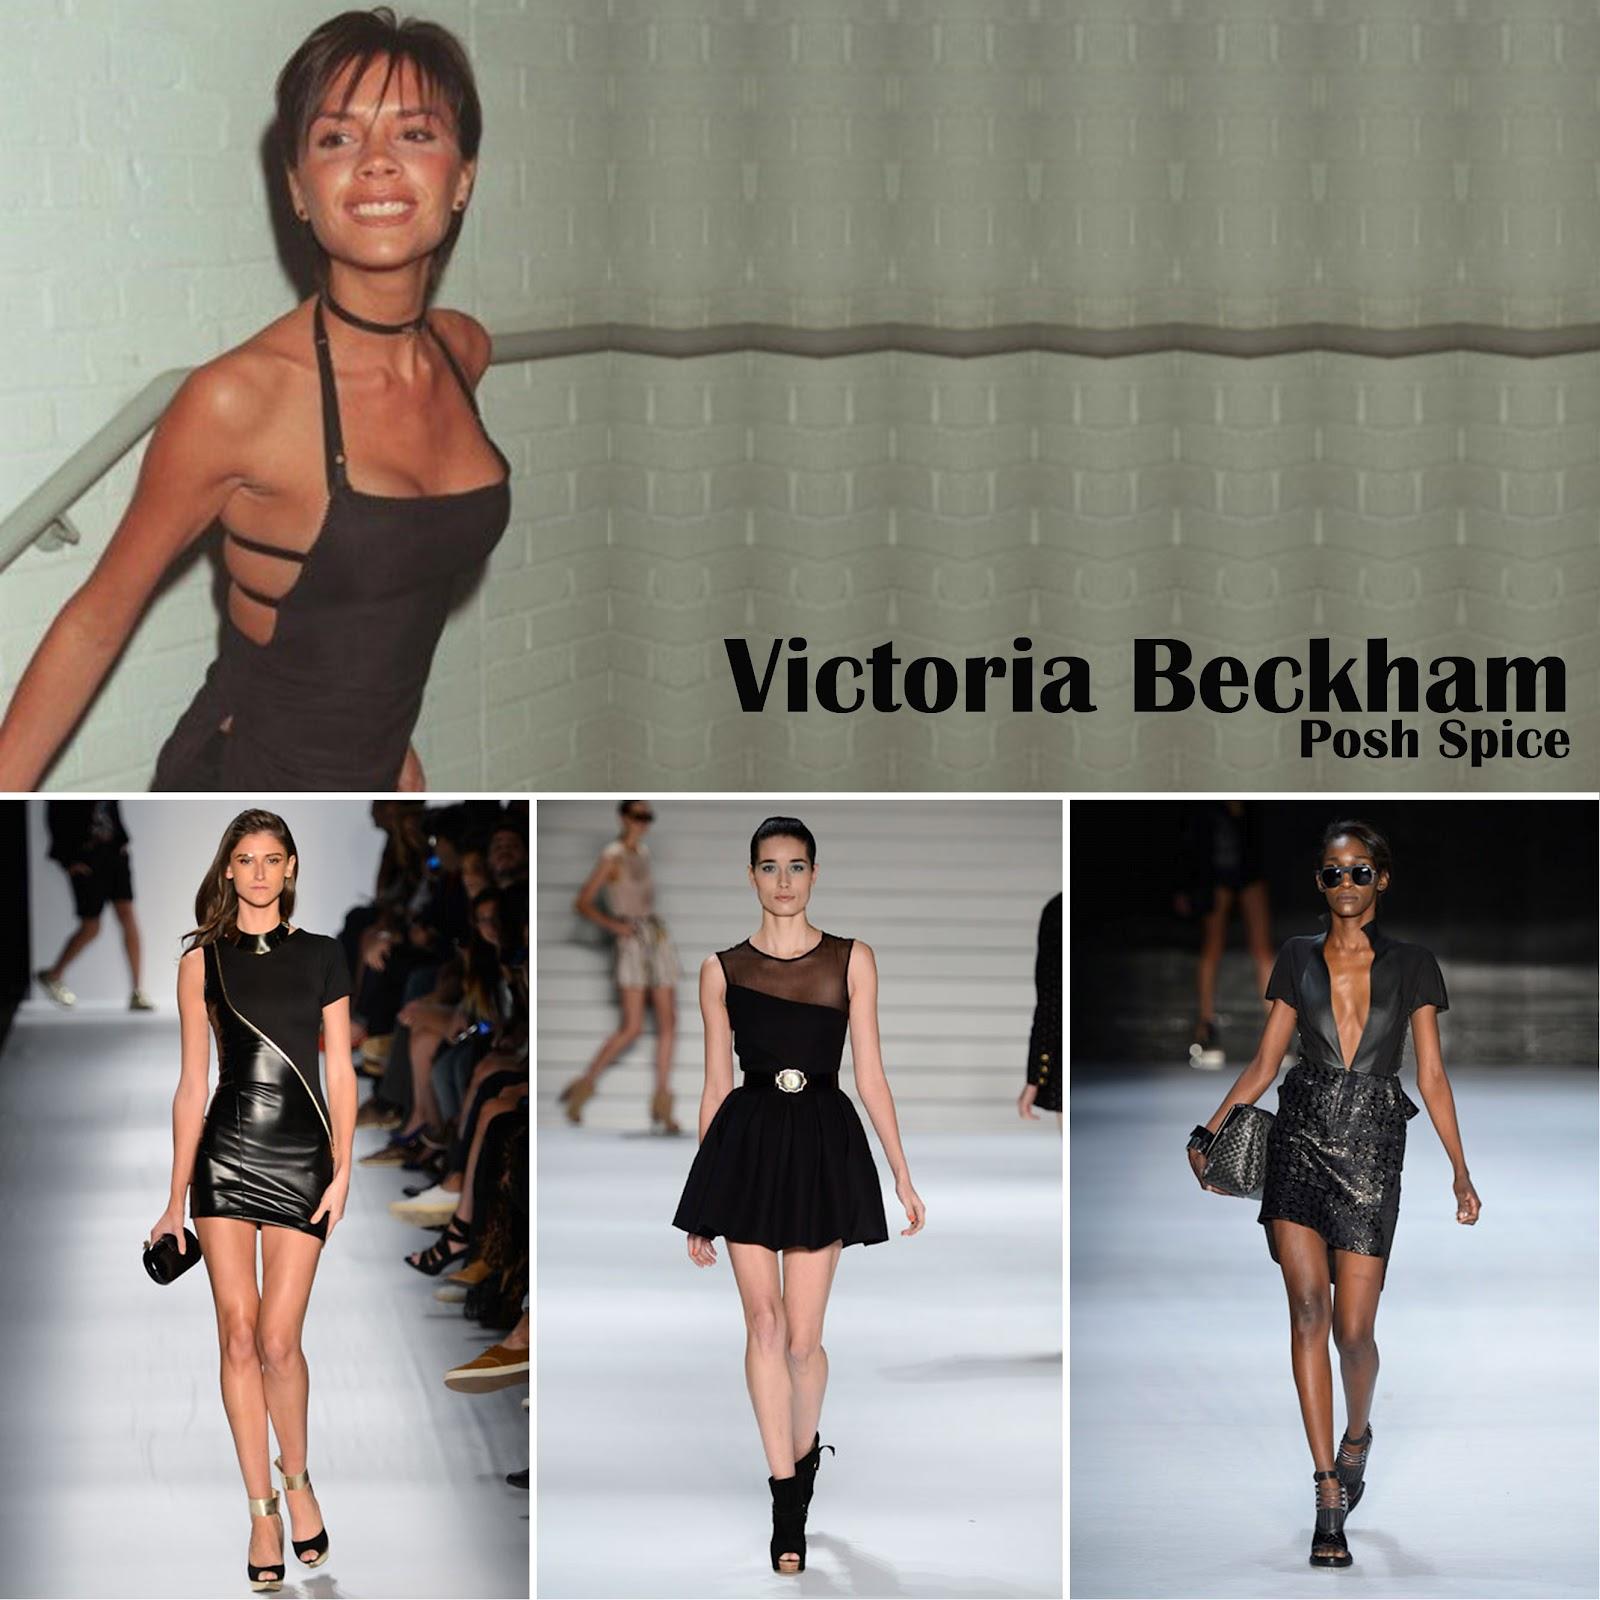 http://3.bp.blogspot.com/-d0EIwGUC_Vw/T-z8sOJg1EI/AAAAAAAAKwk/jktQl4gB8xY/s1600/0+-+Victoria+Beckham+-+POSH+SPICE.jpg